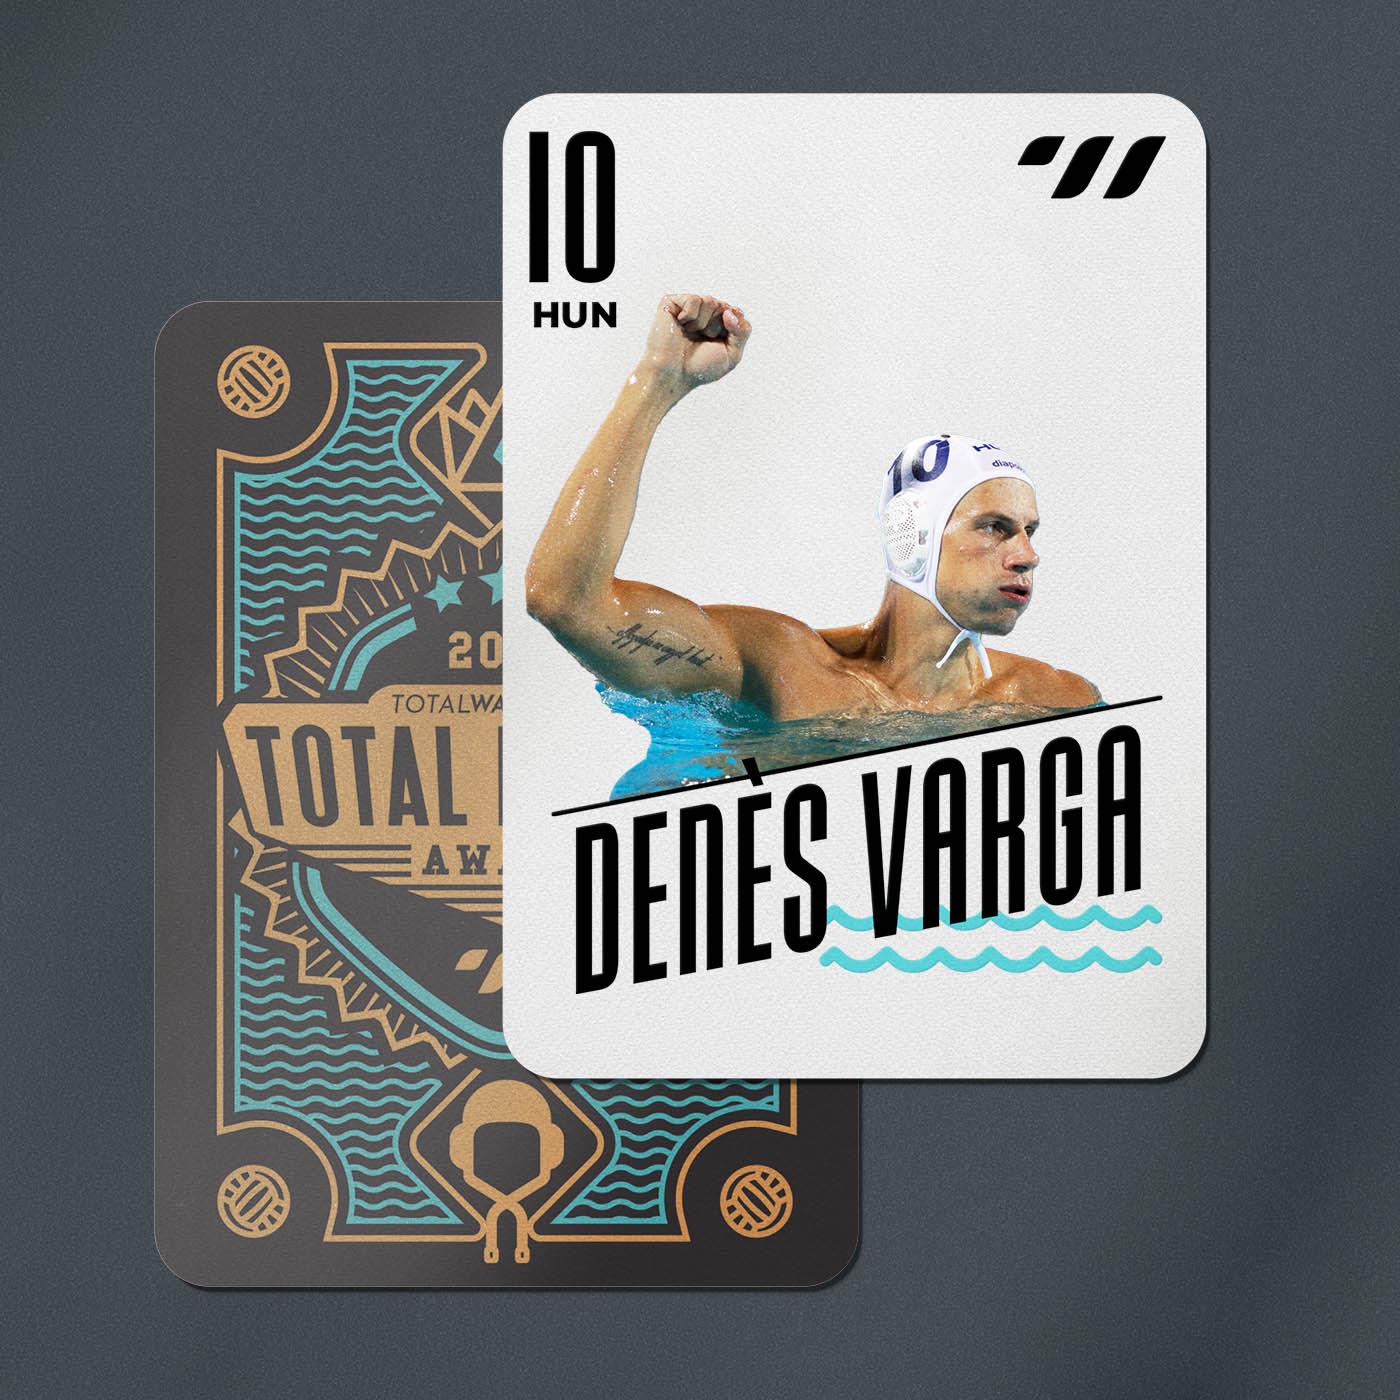 LEFT DRIVER - Denes Varga (HUN)